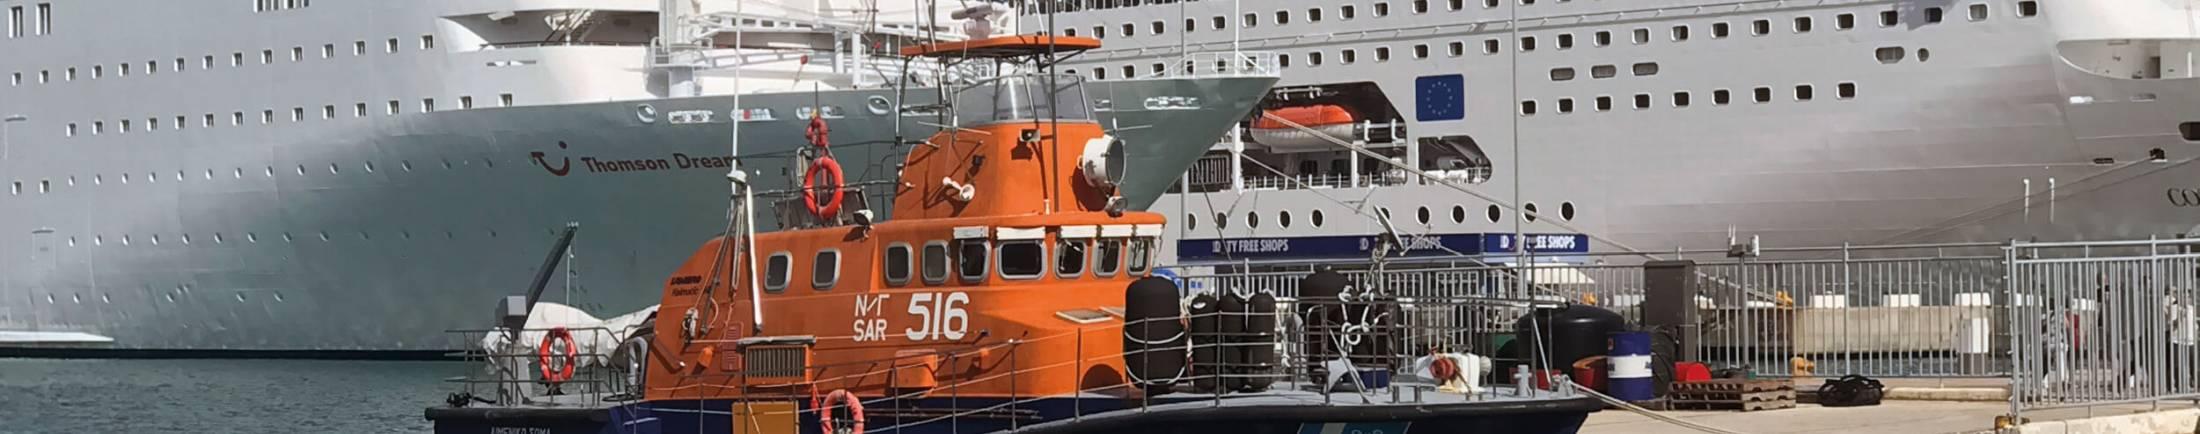 Crewtender en loodsboot header